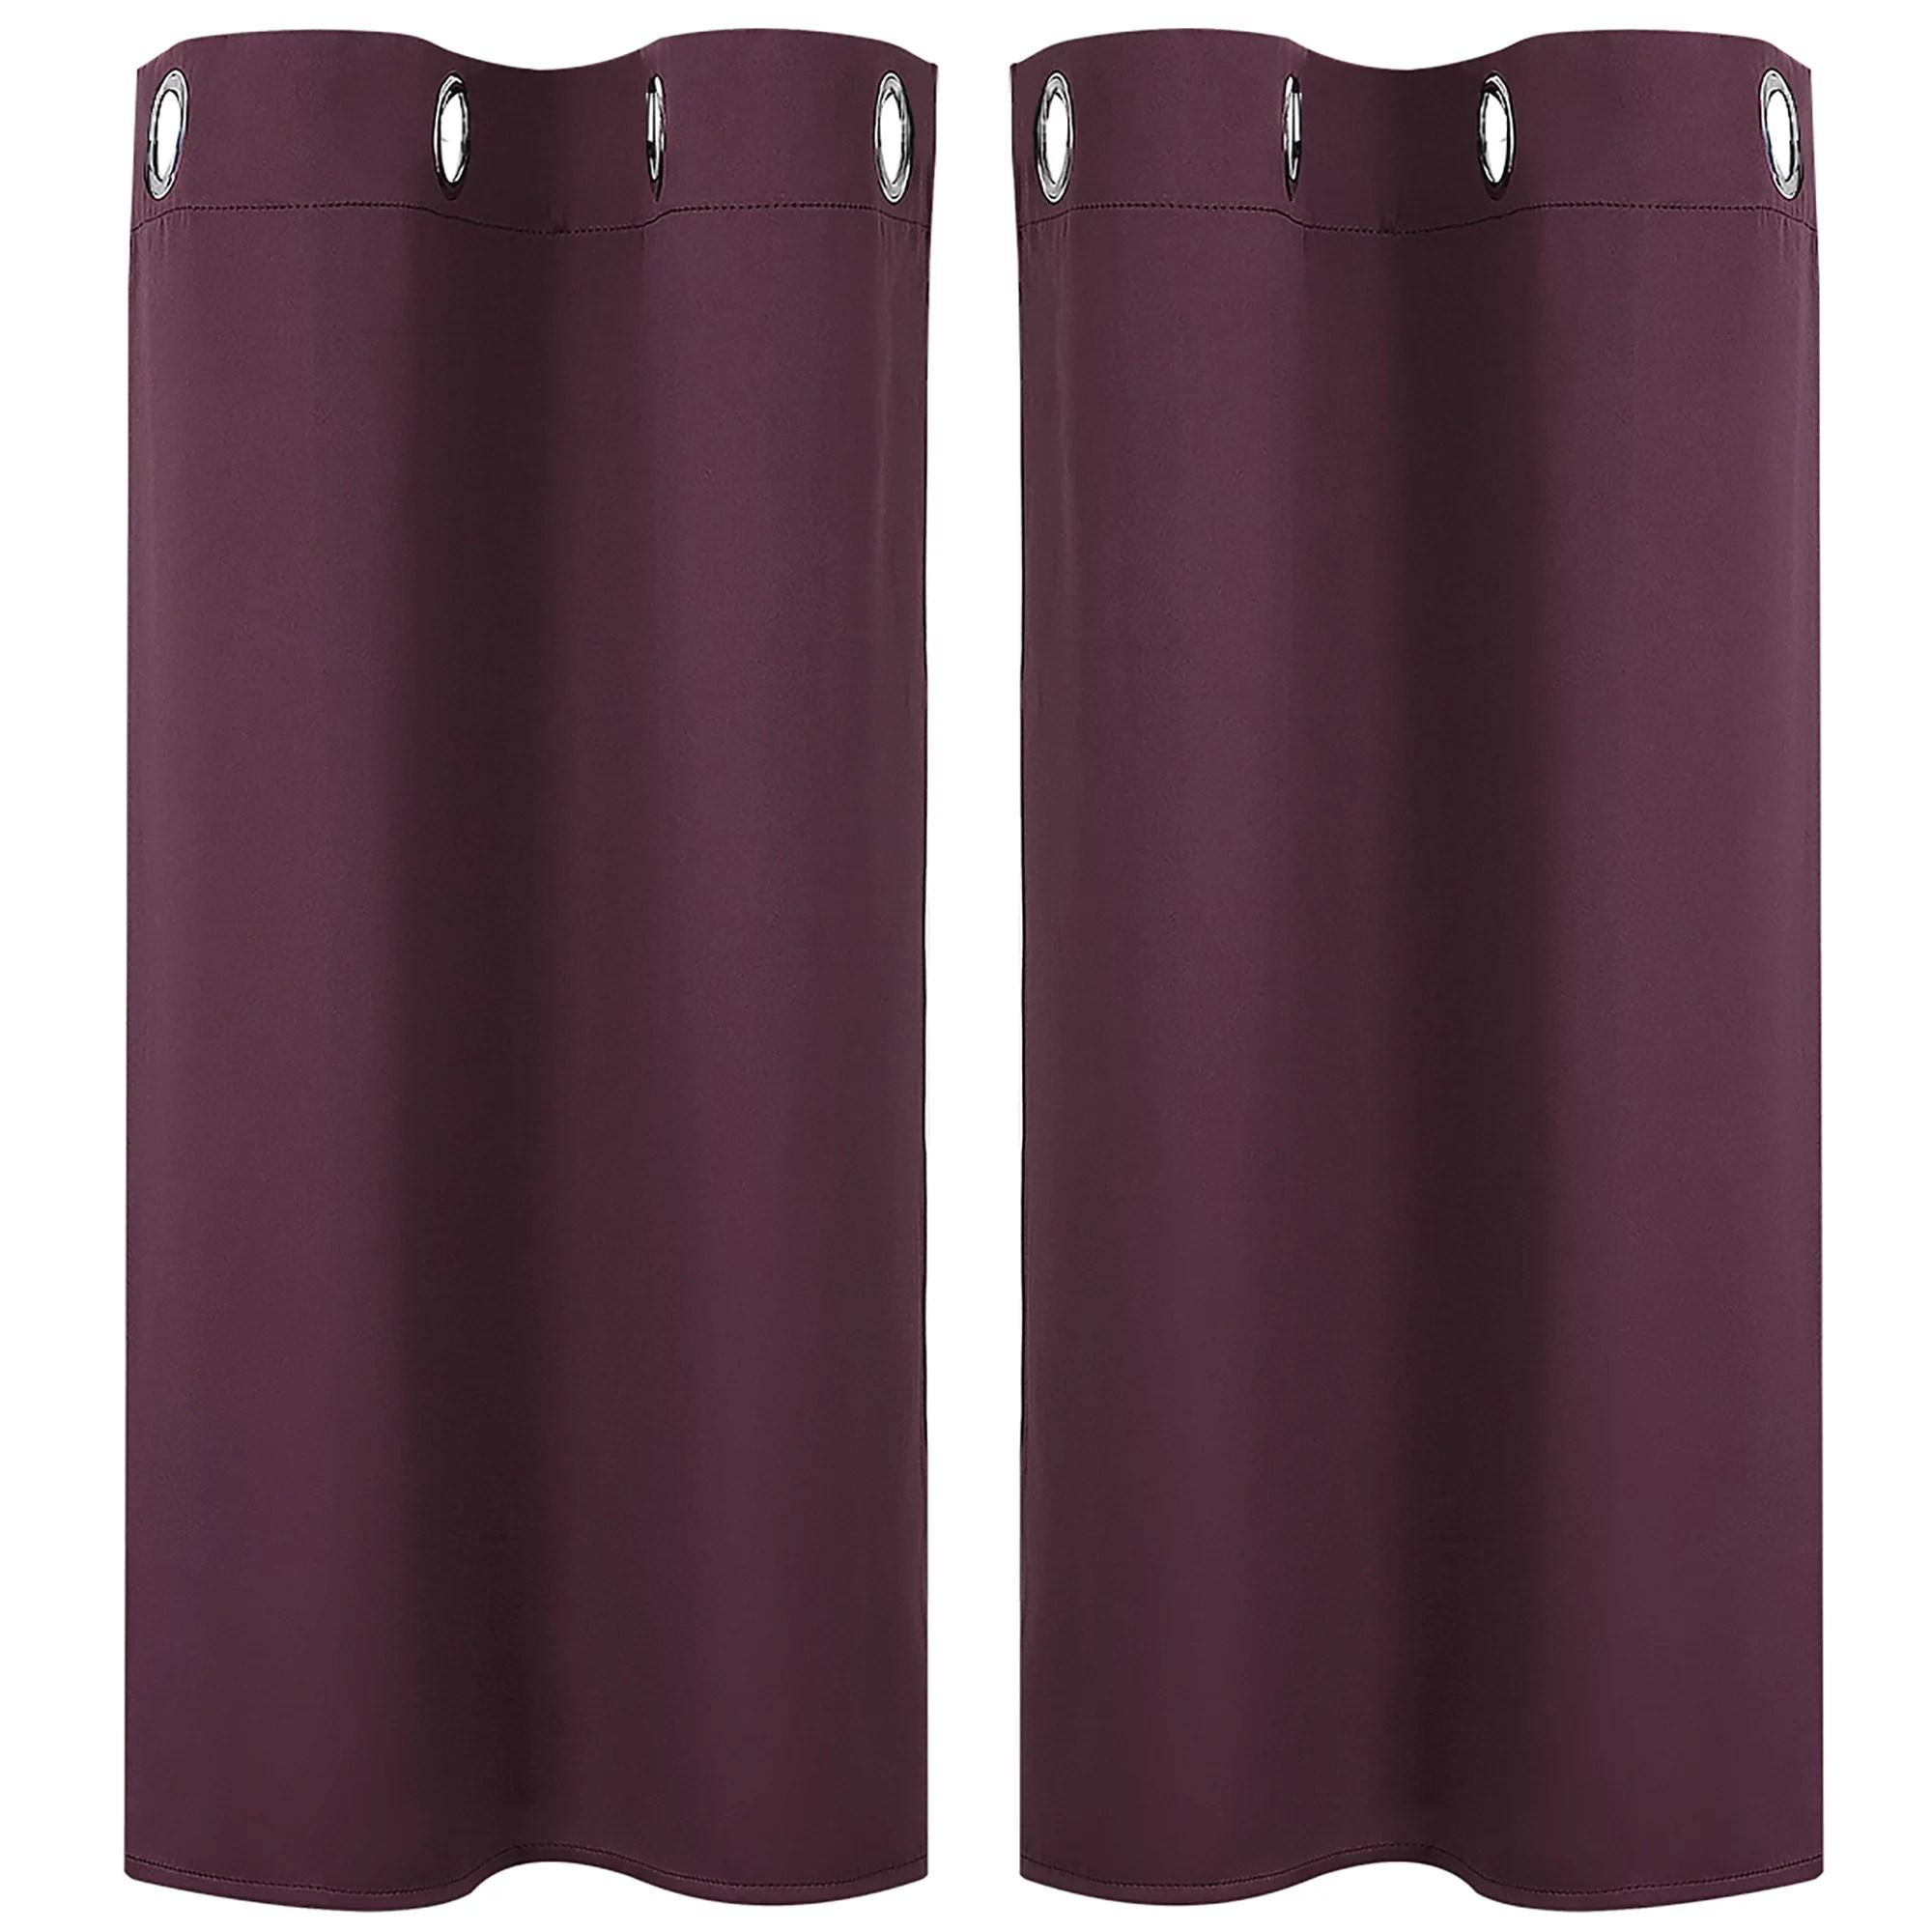 kitchen small window blackout curtains panels set of 2 burgundy 29 x 36 walmart com